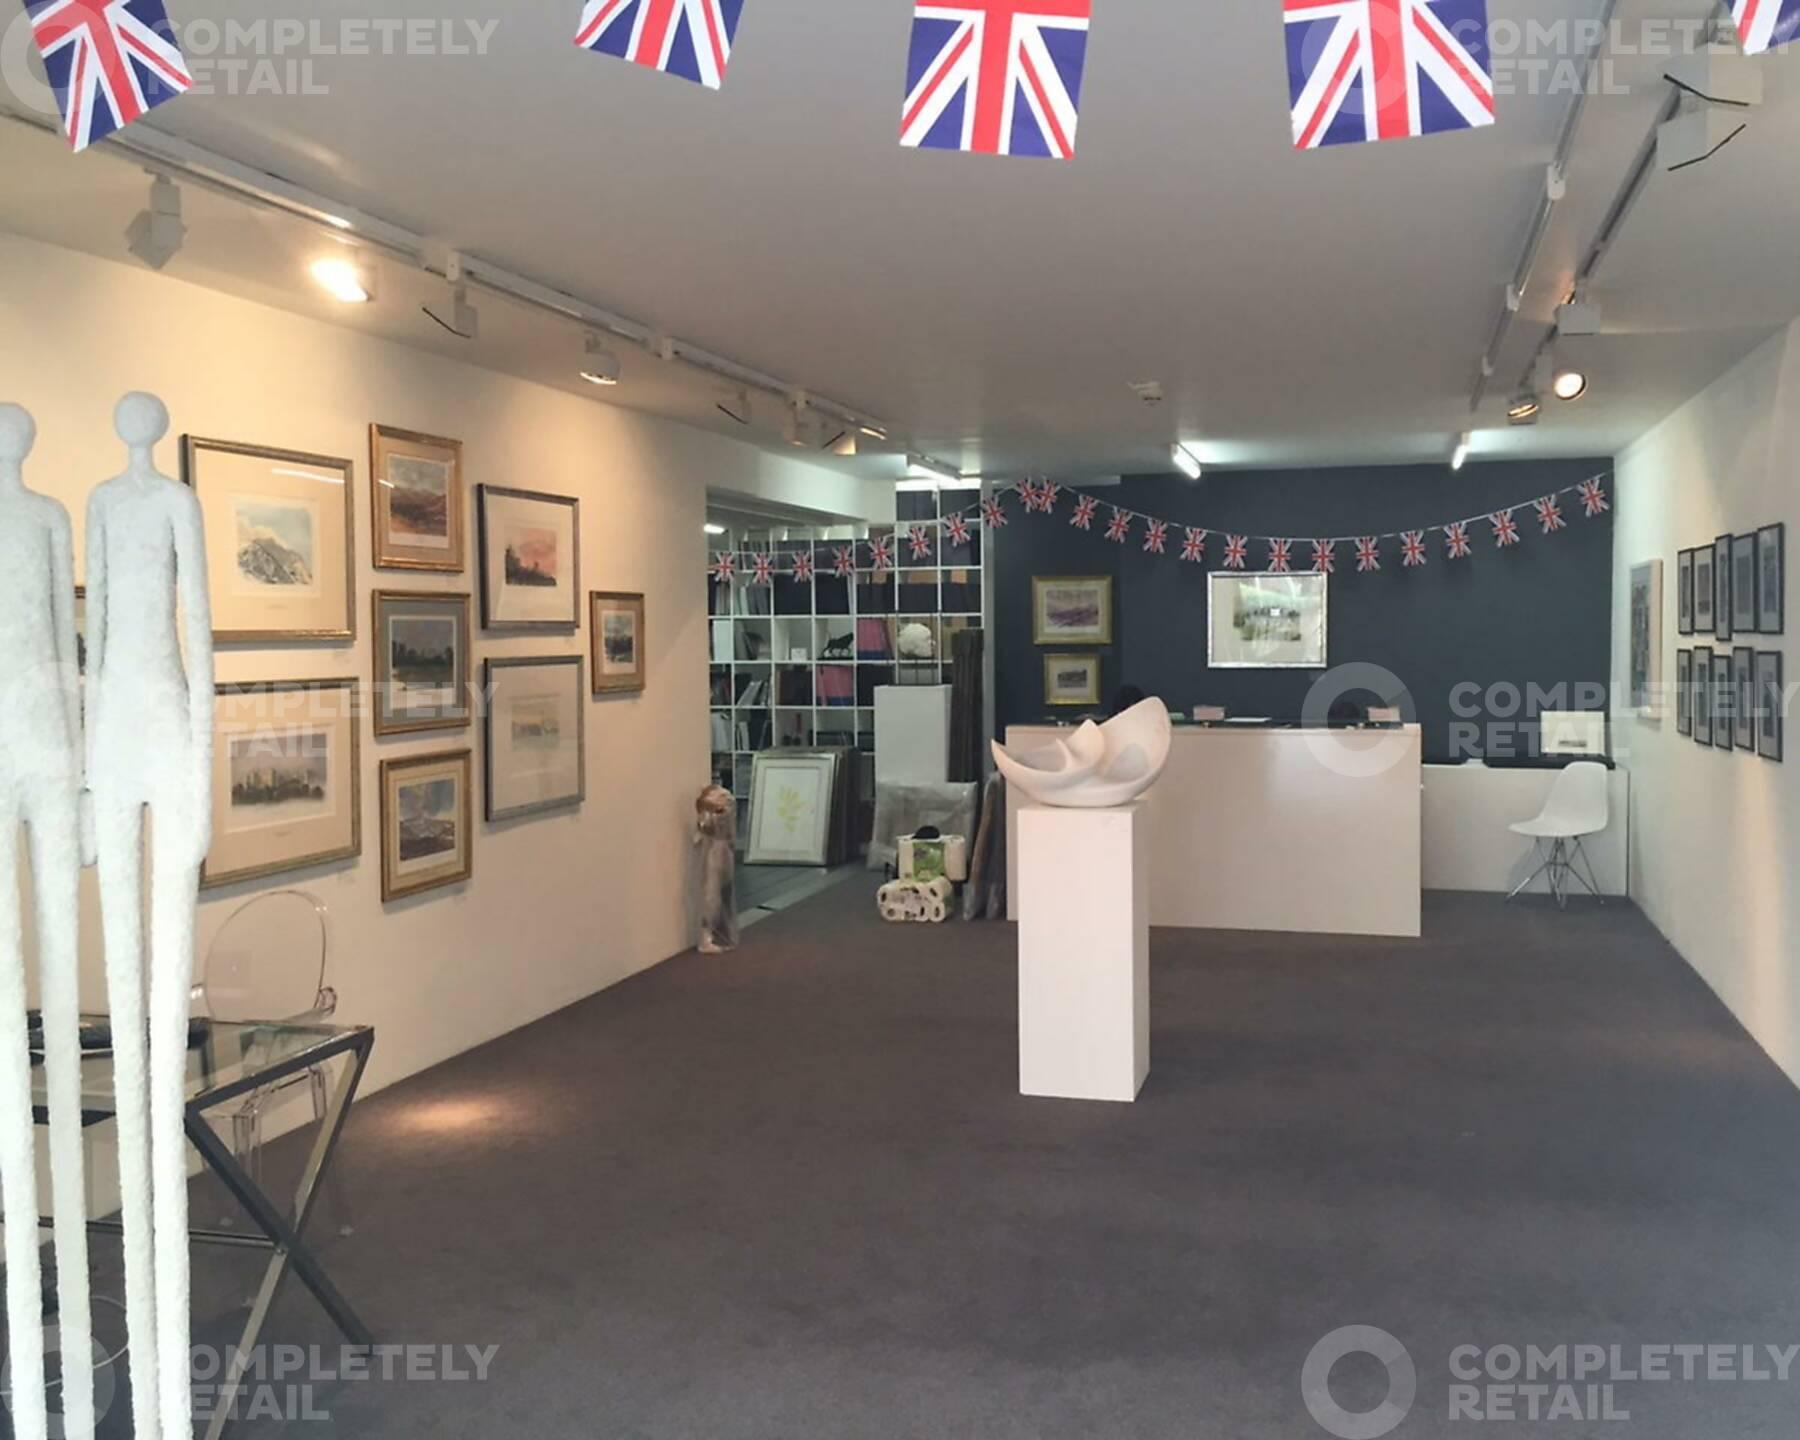 Belgravia Gallery, 23 Maddox Street